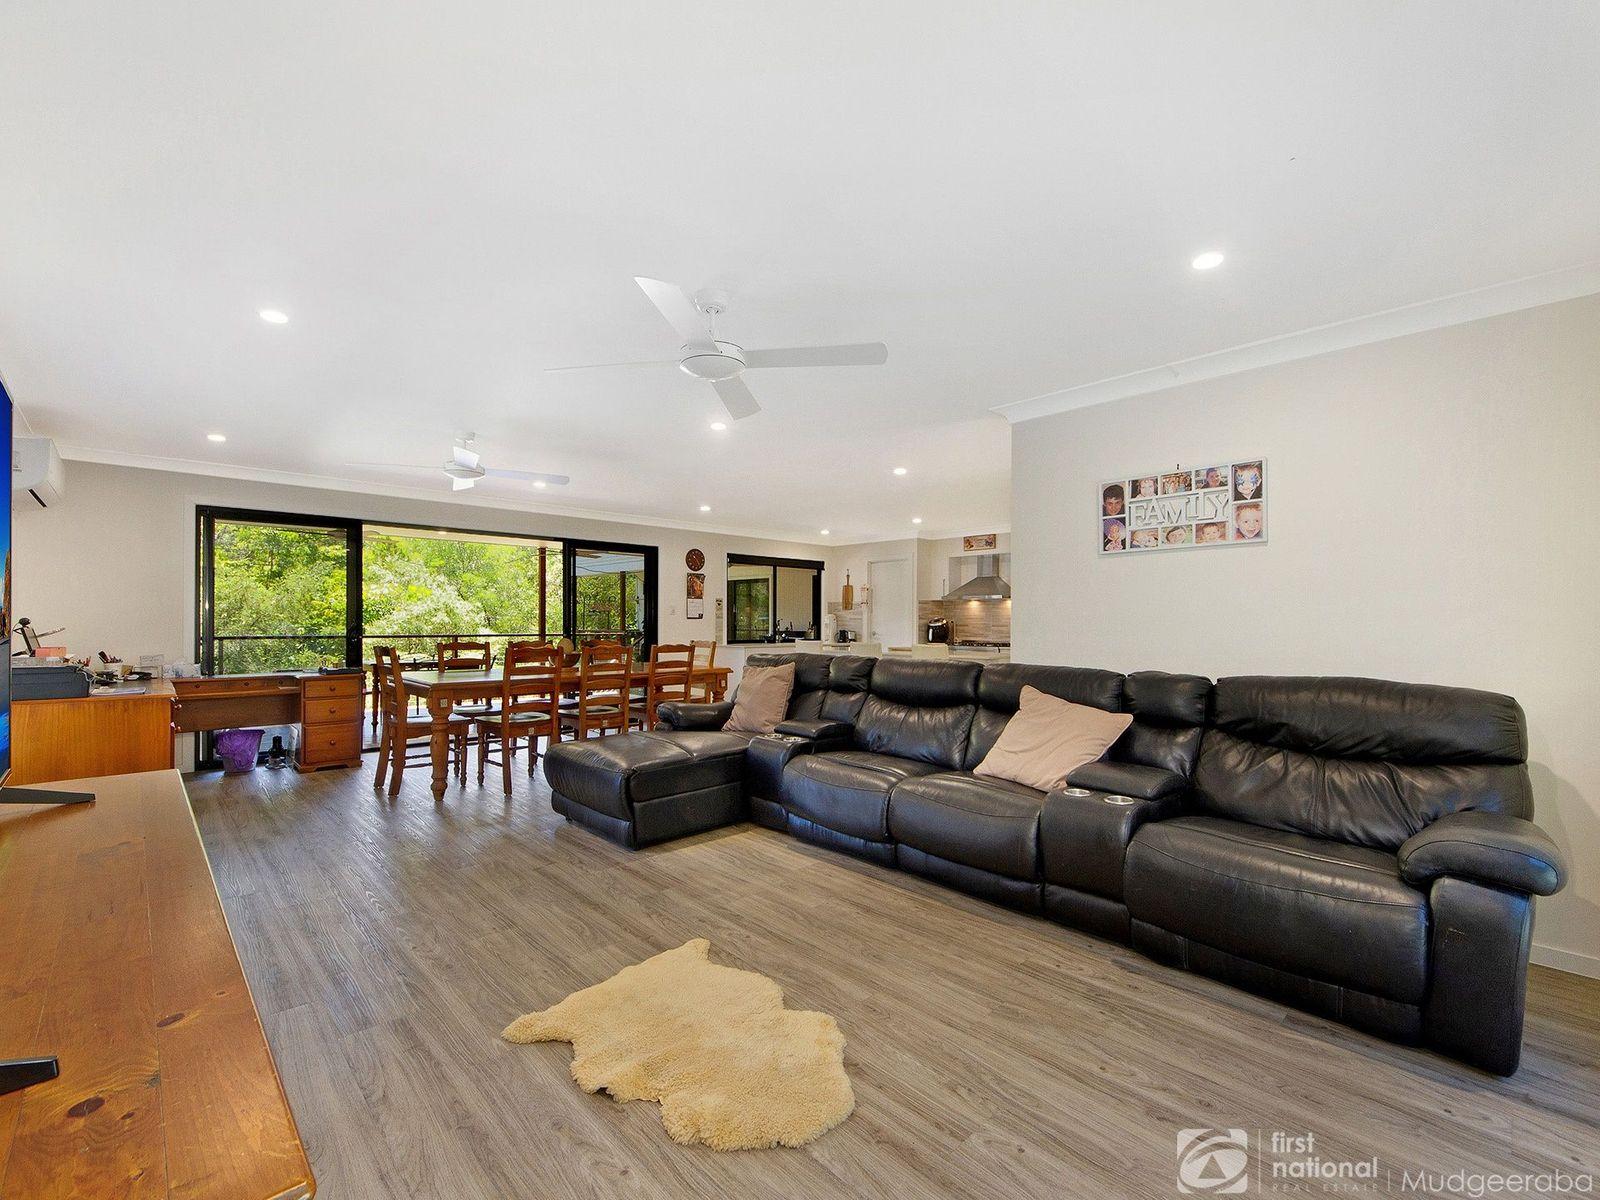 2/52 Bonogin Road, Mudgeeraba, QLD 4213